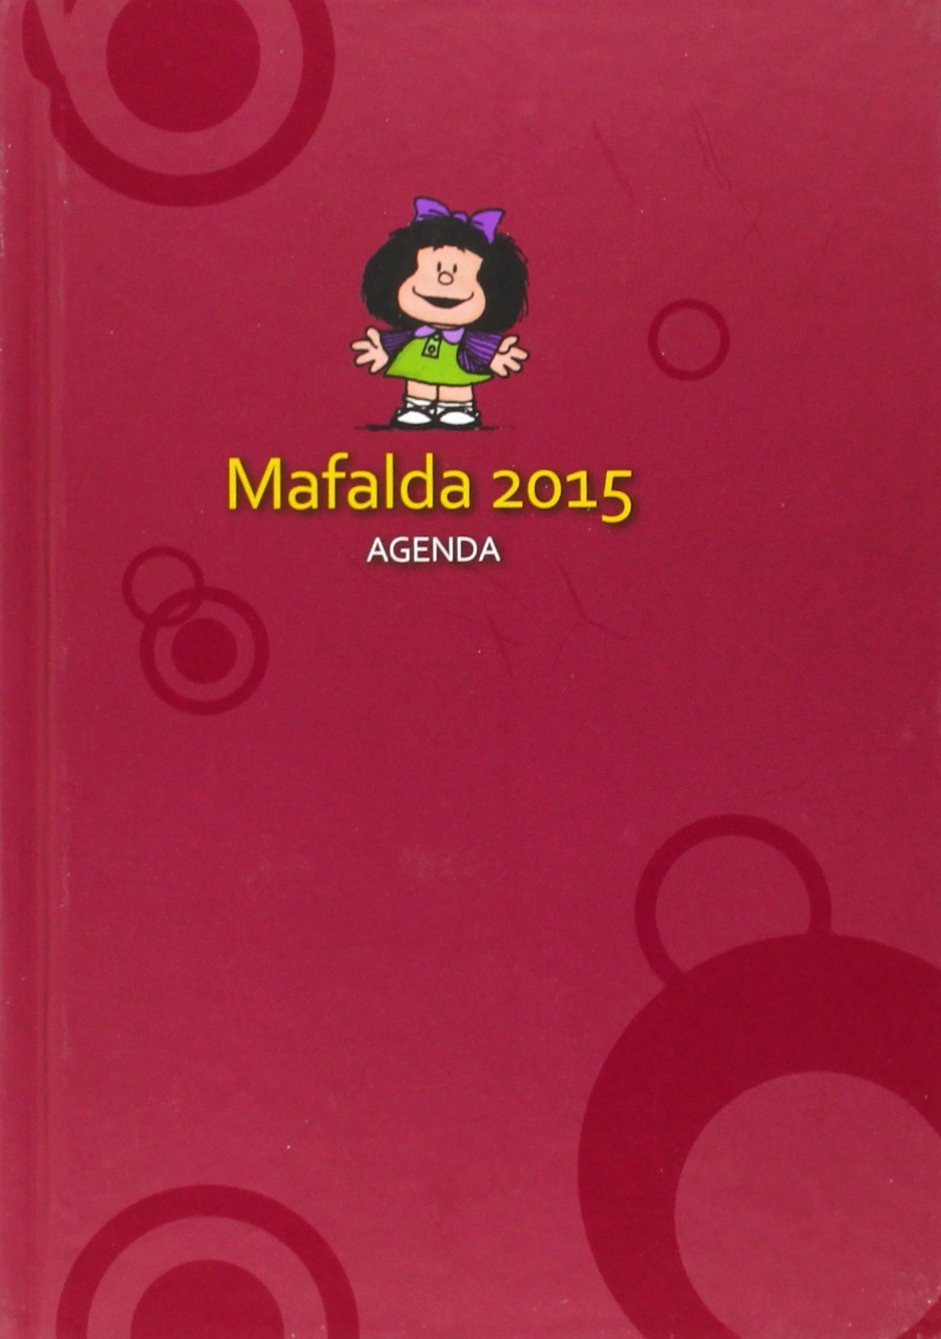 Agenda Mafalda 2015: Amazon.es: Vv.Aa.: Libros